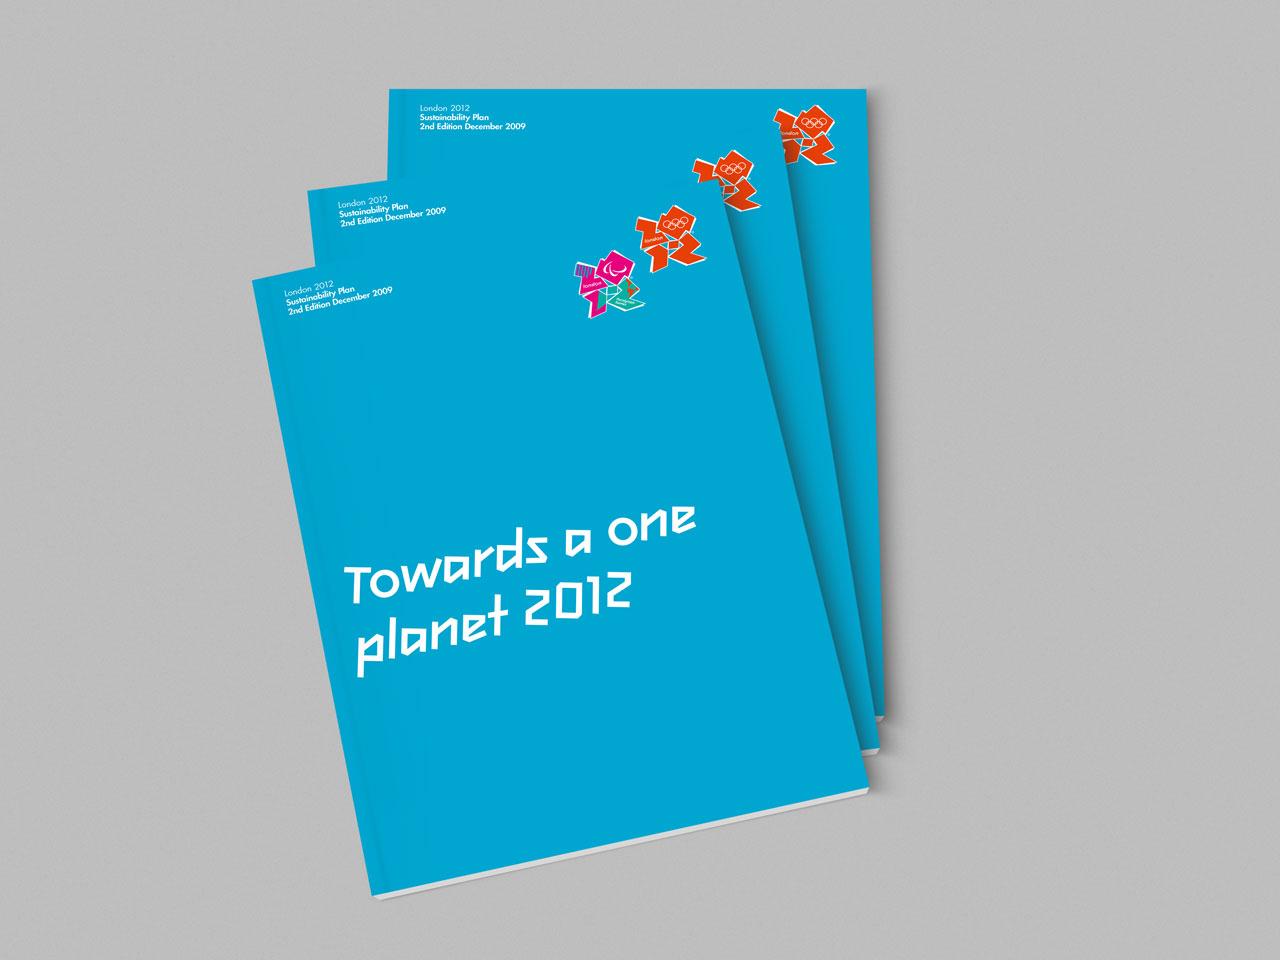 london-2012-sustainability-mockup-cover.jpg